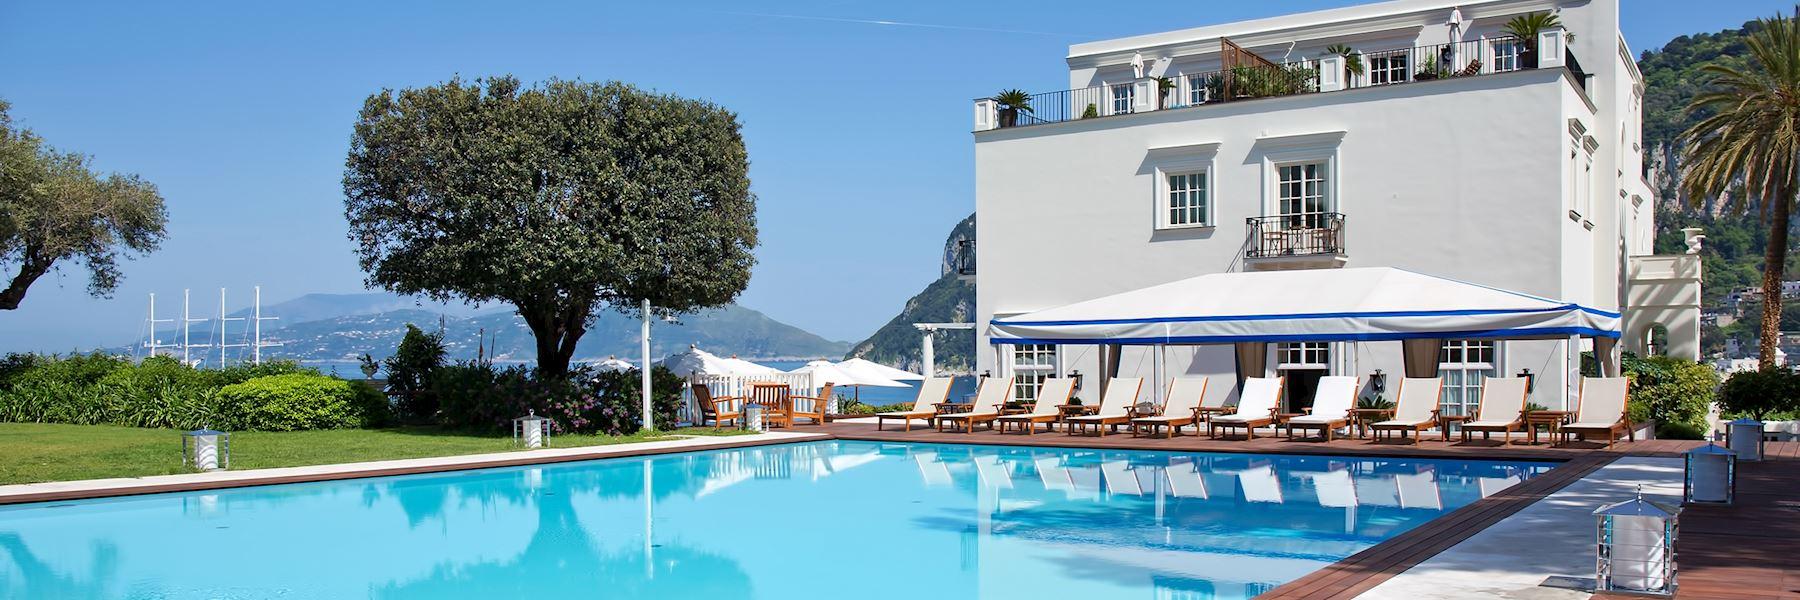 Jk Place Capri j k place capri | hotels in capri | audley travel